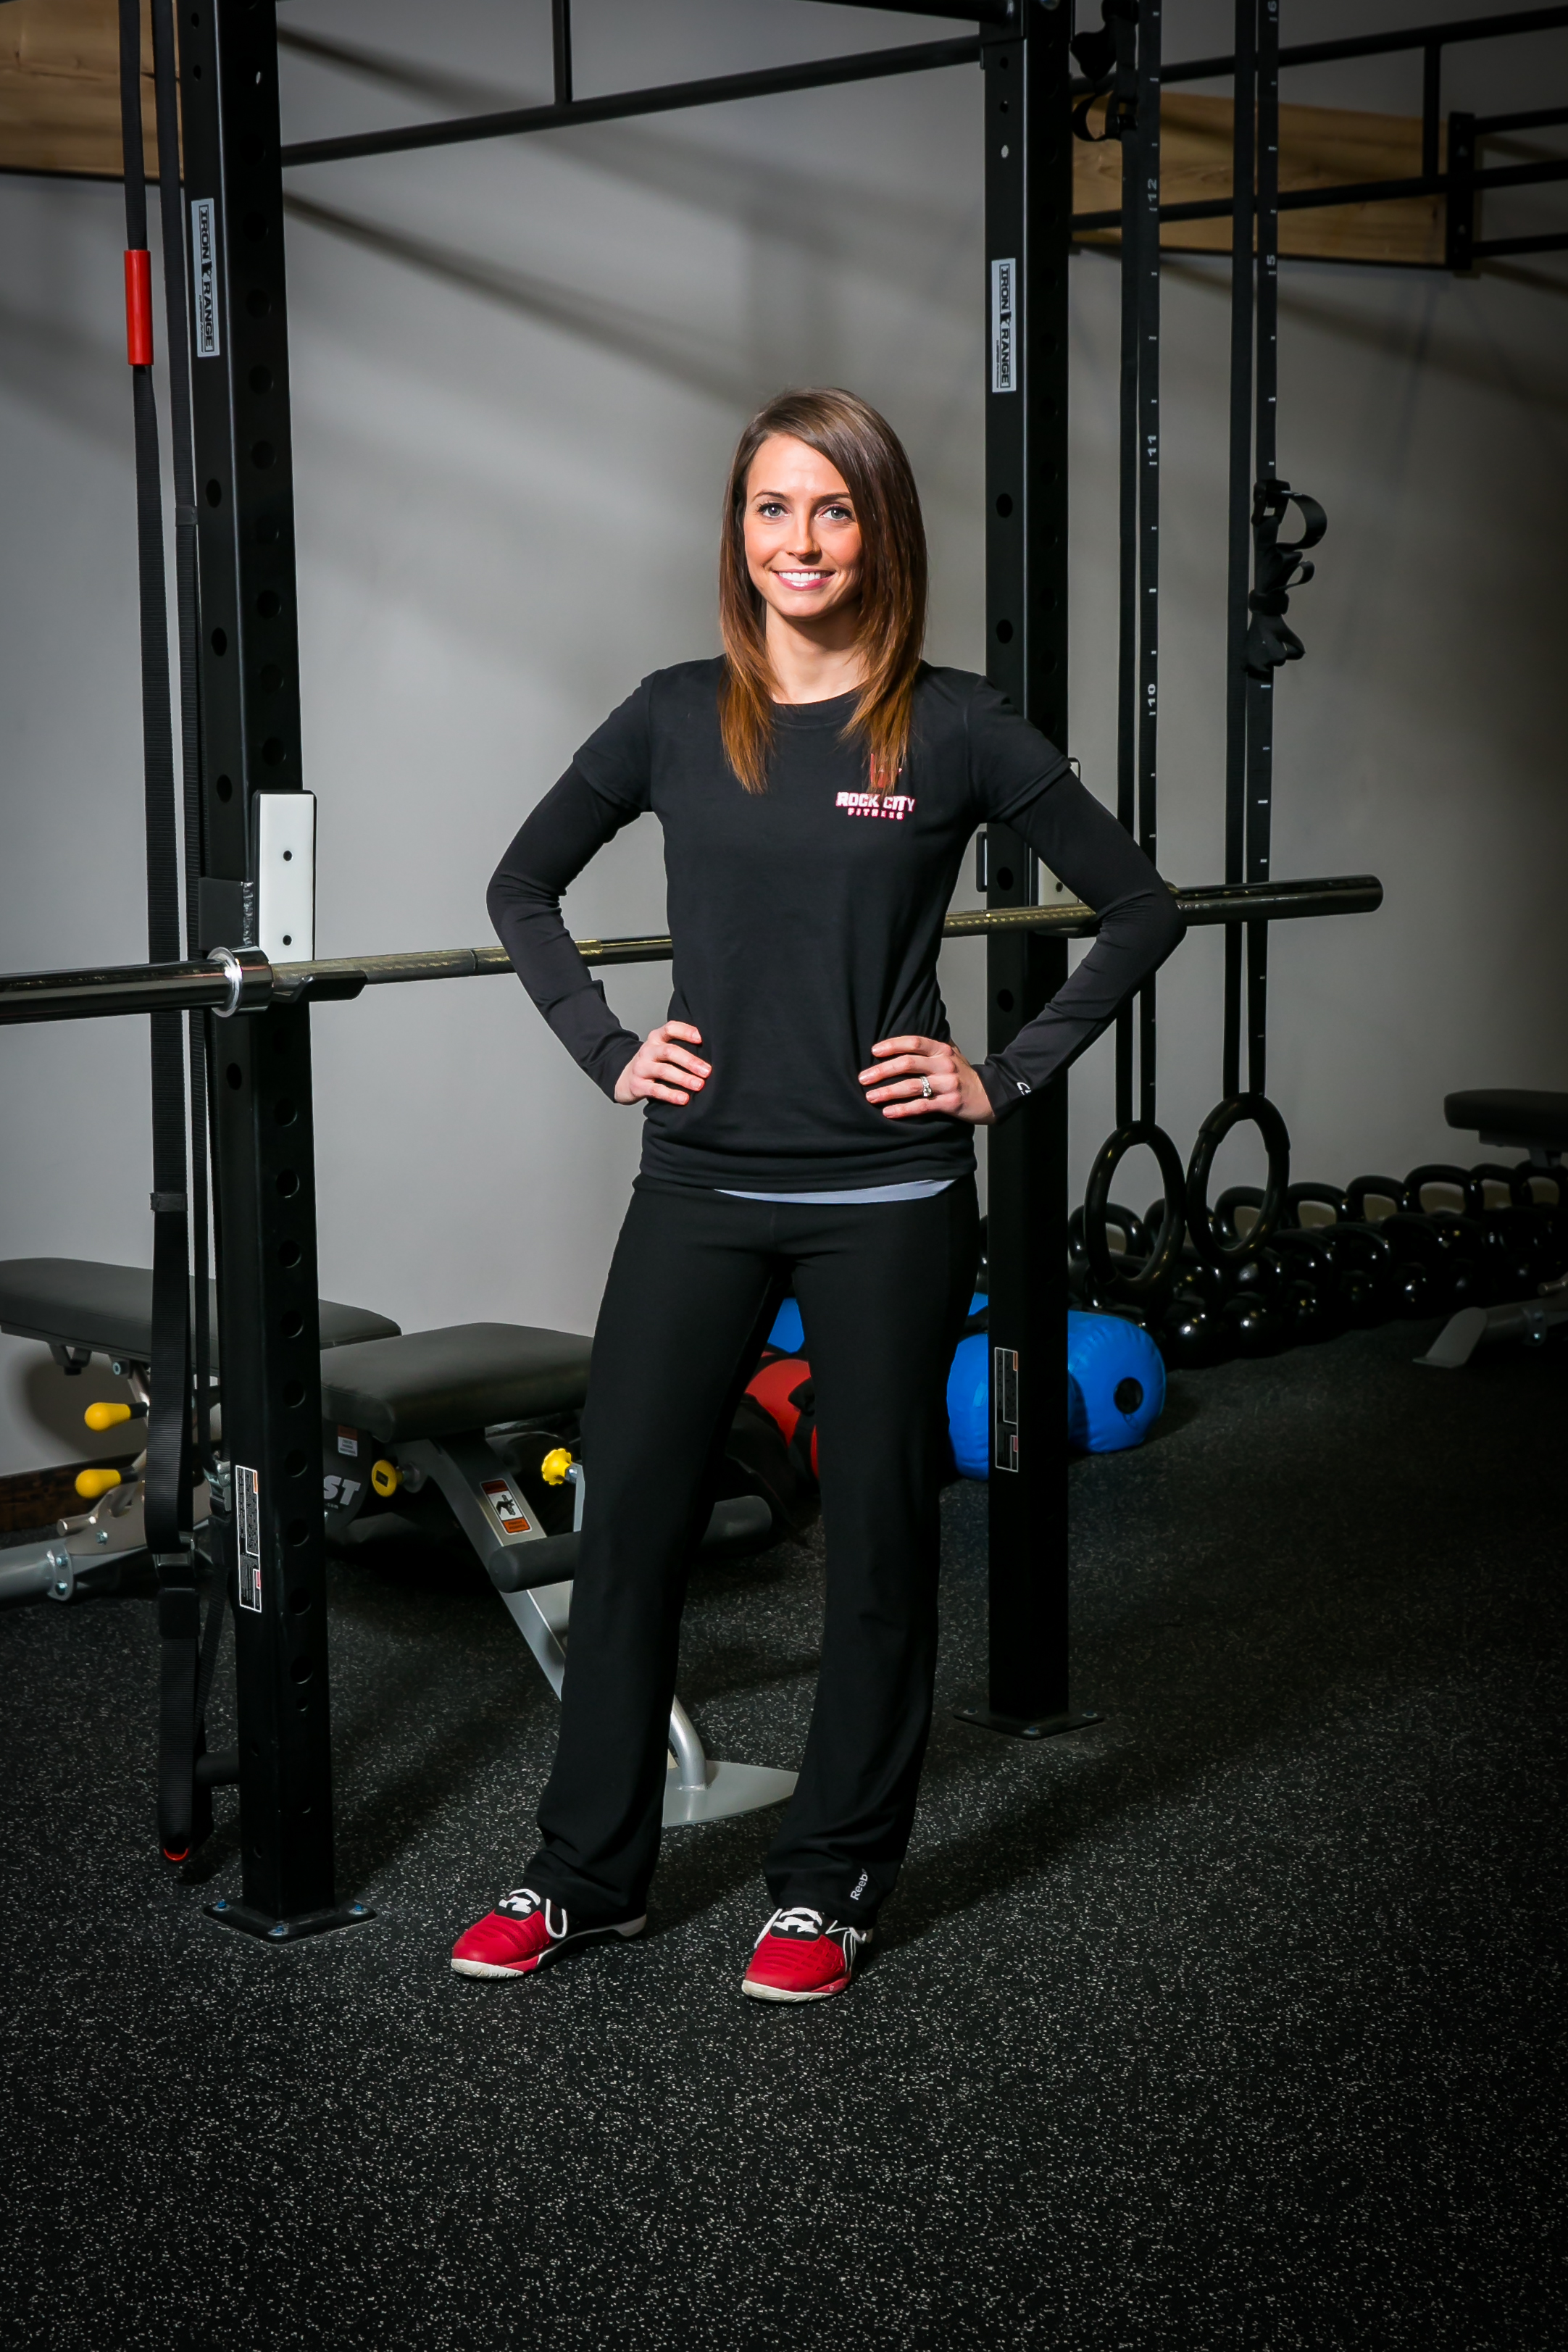 heather hesington personal trainer